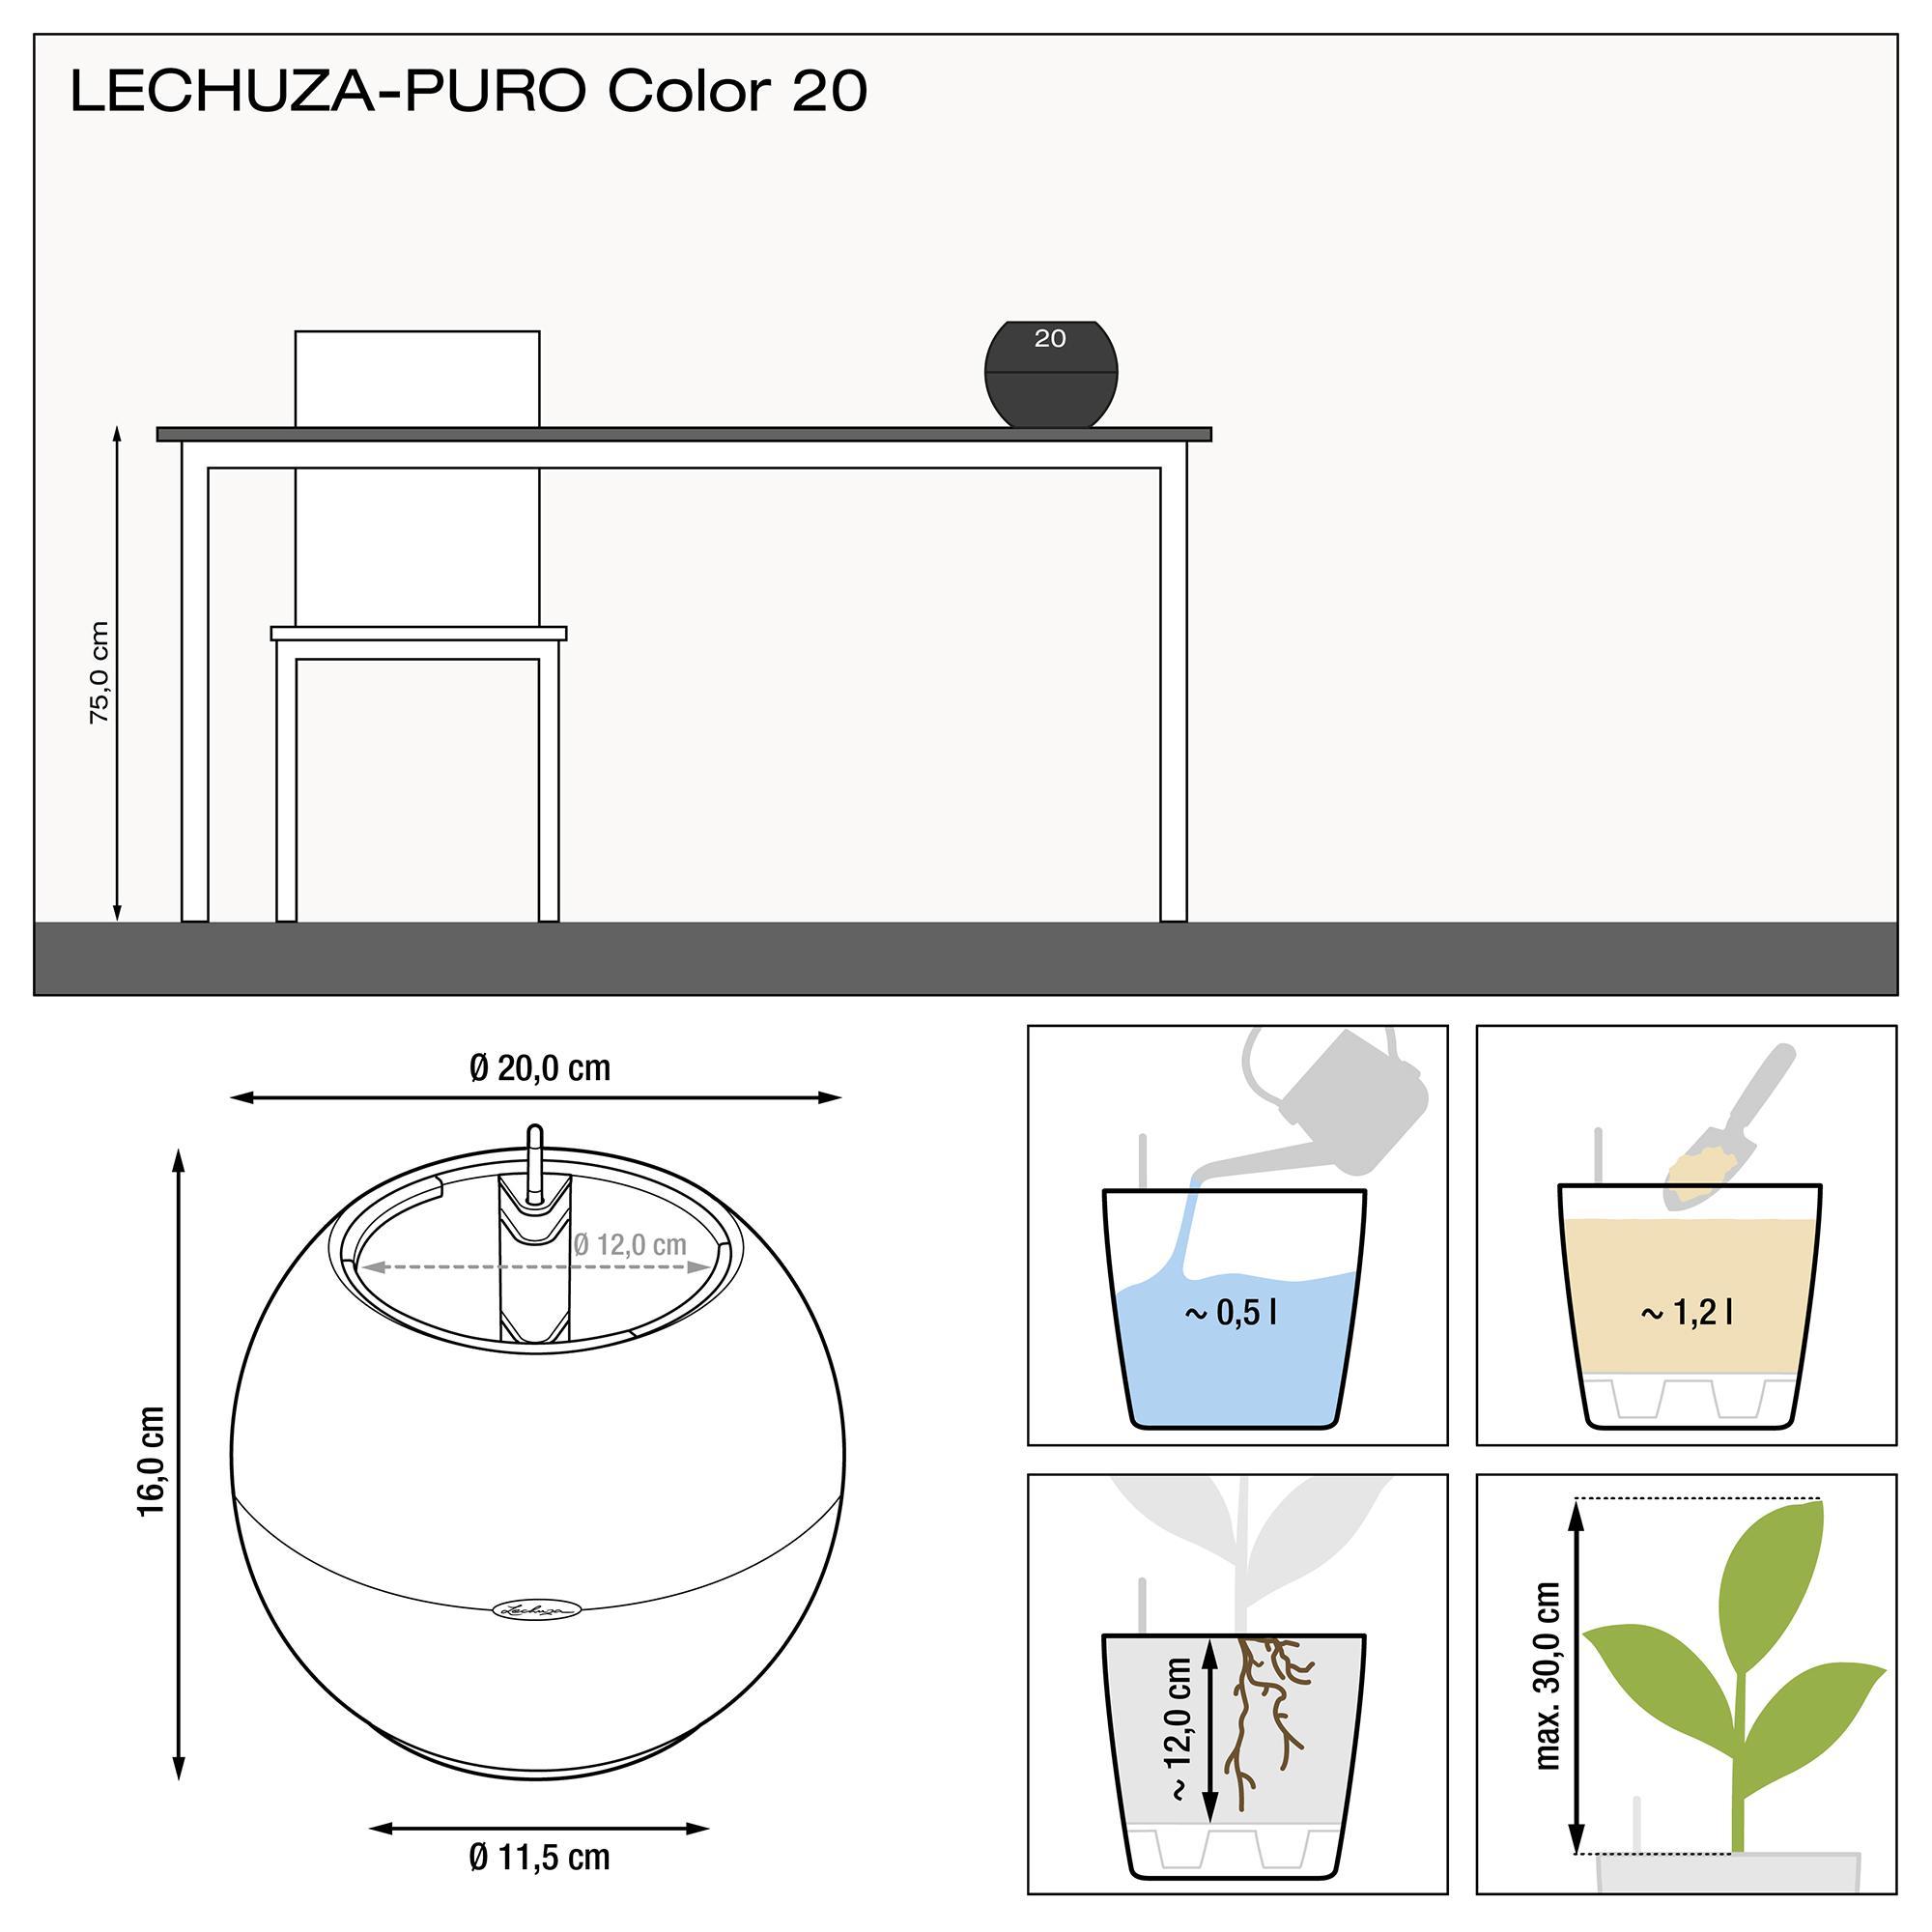 LECHUZA-PURO Color 20 blanc - Image 3